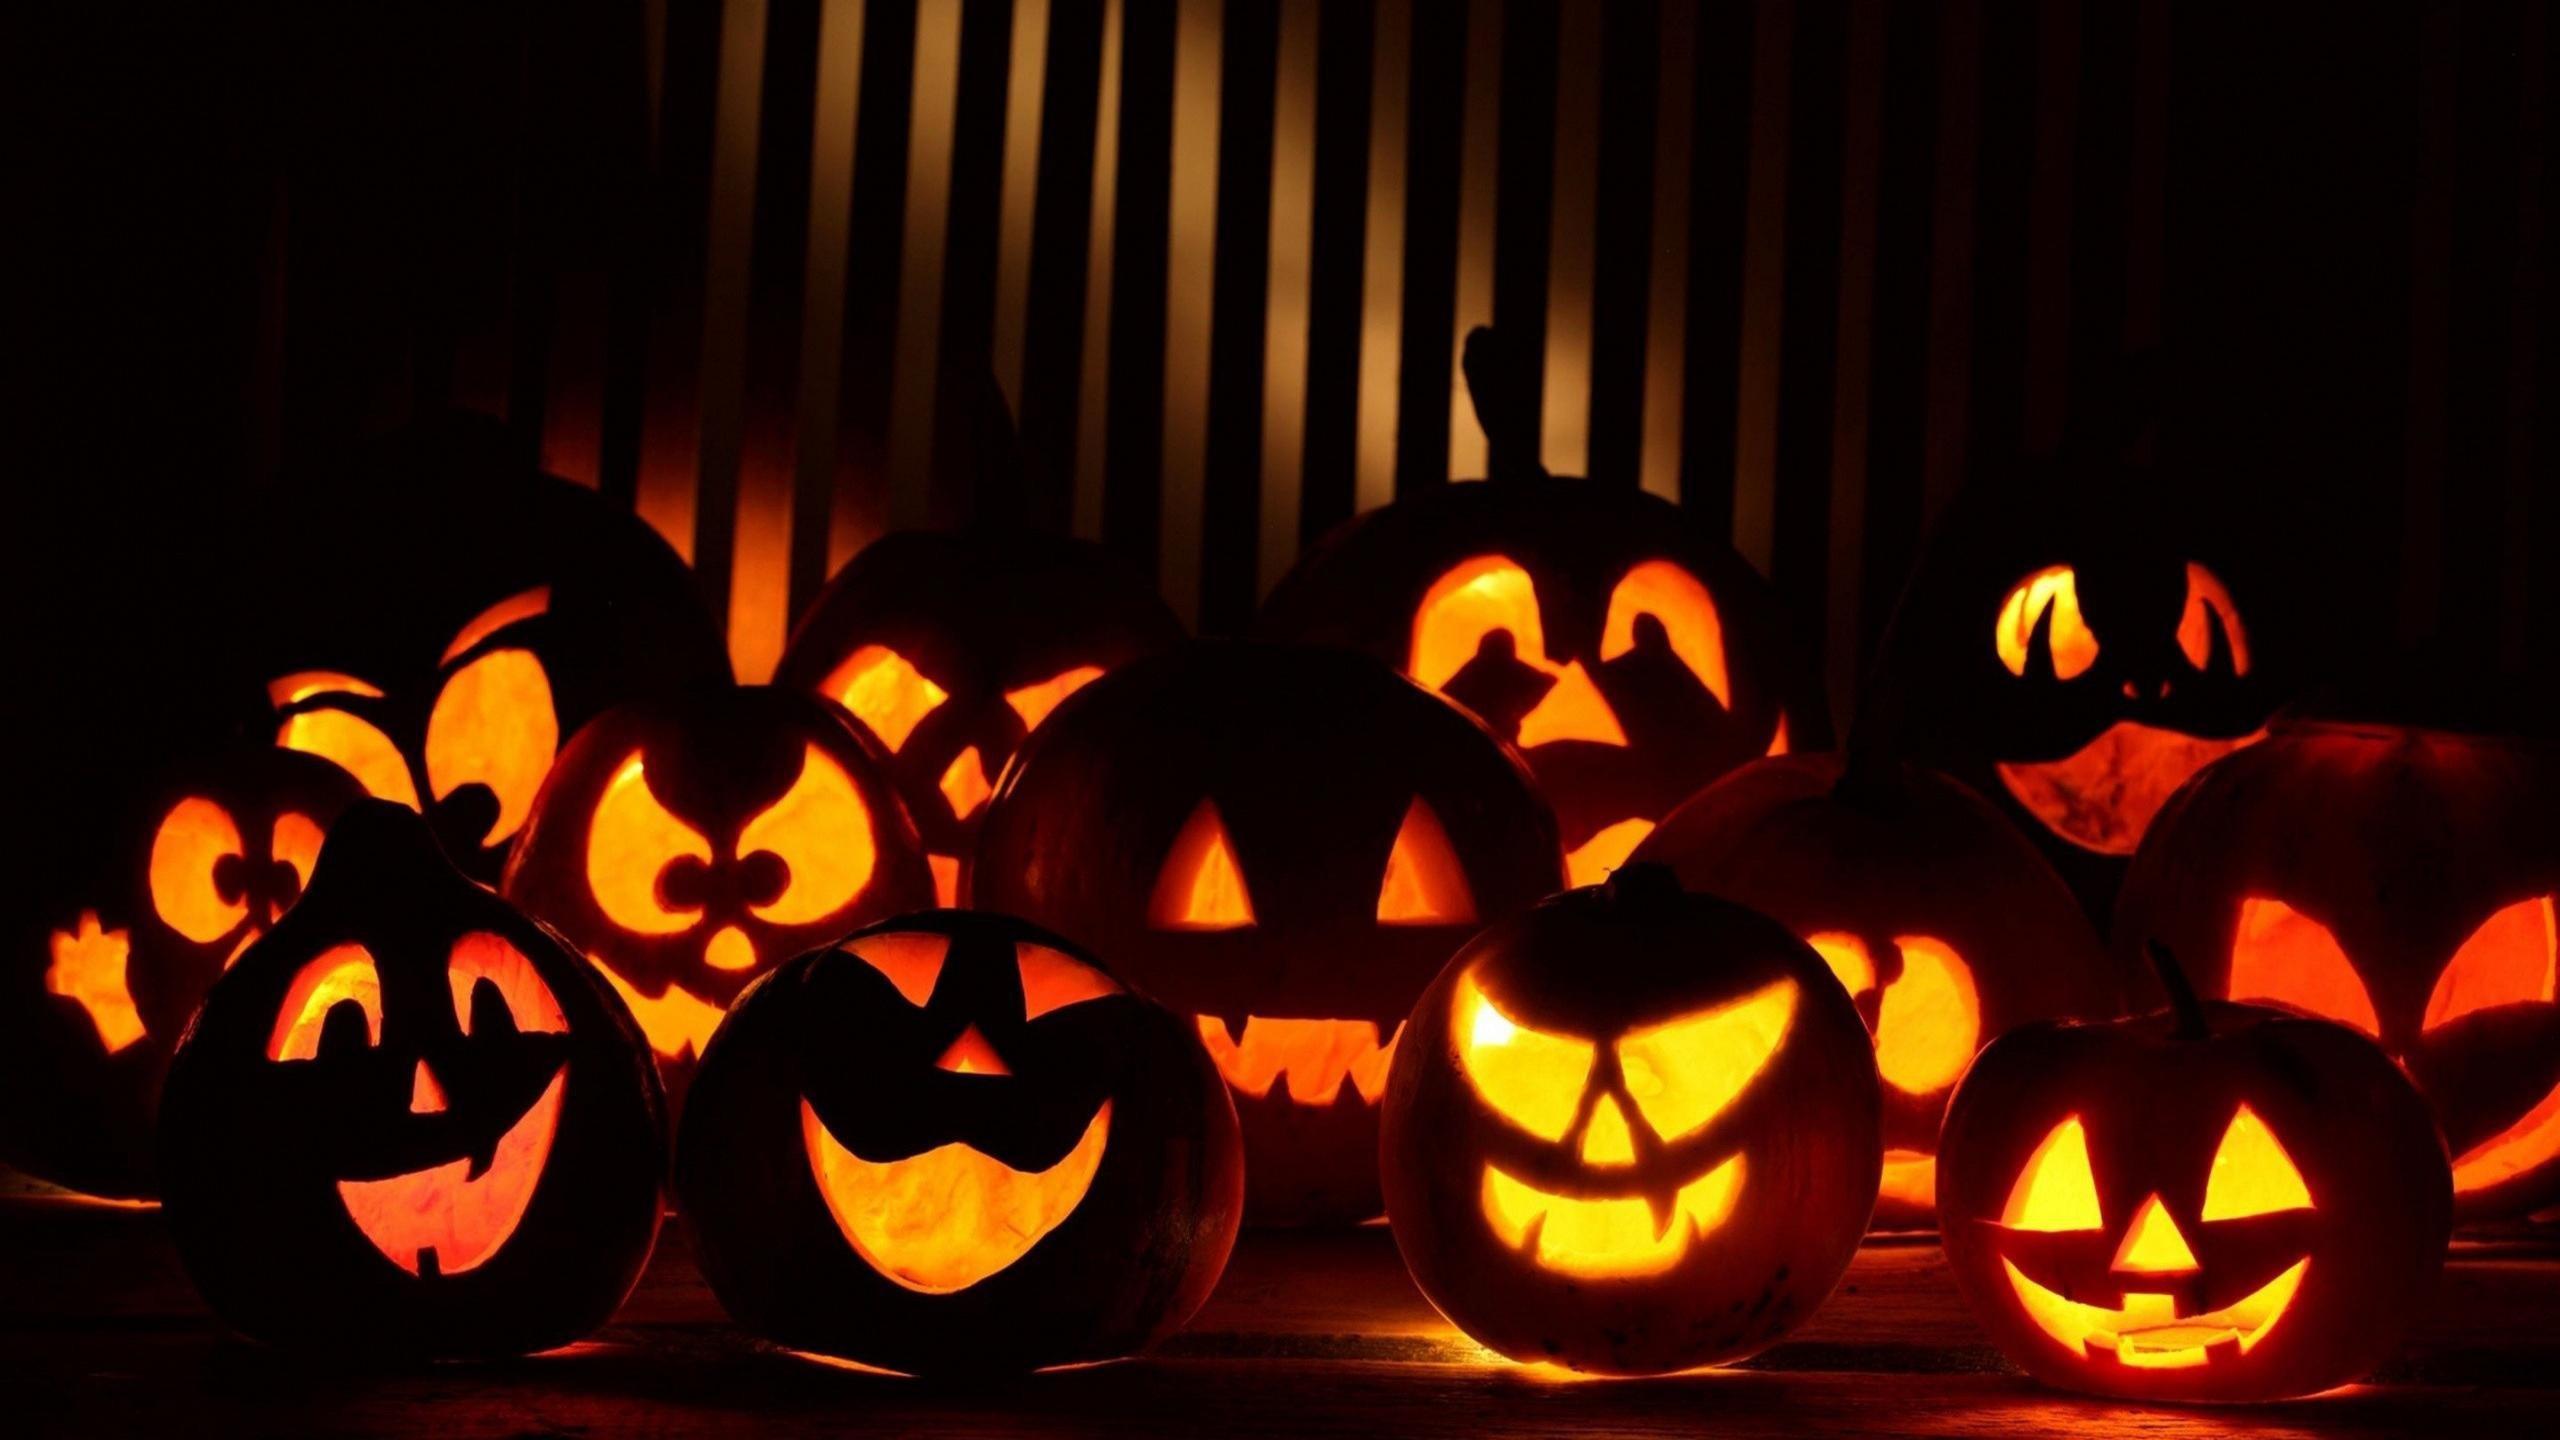 Halloween HD Deskto